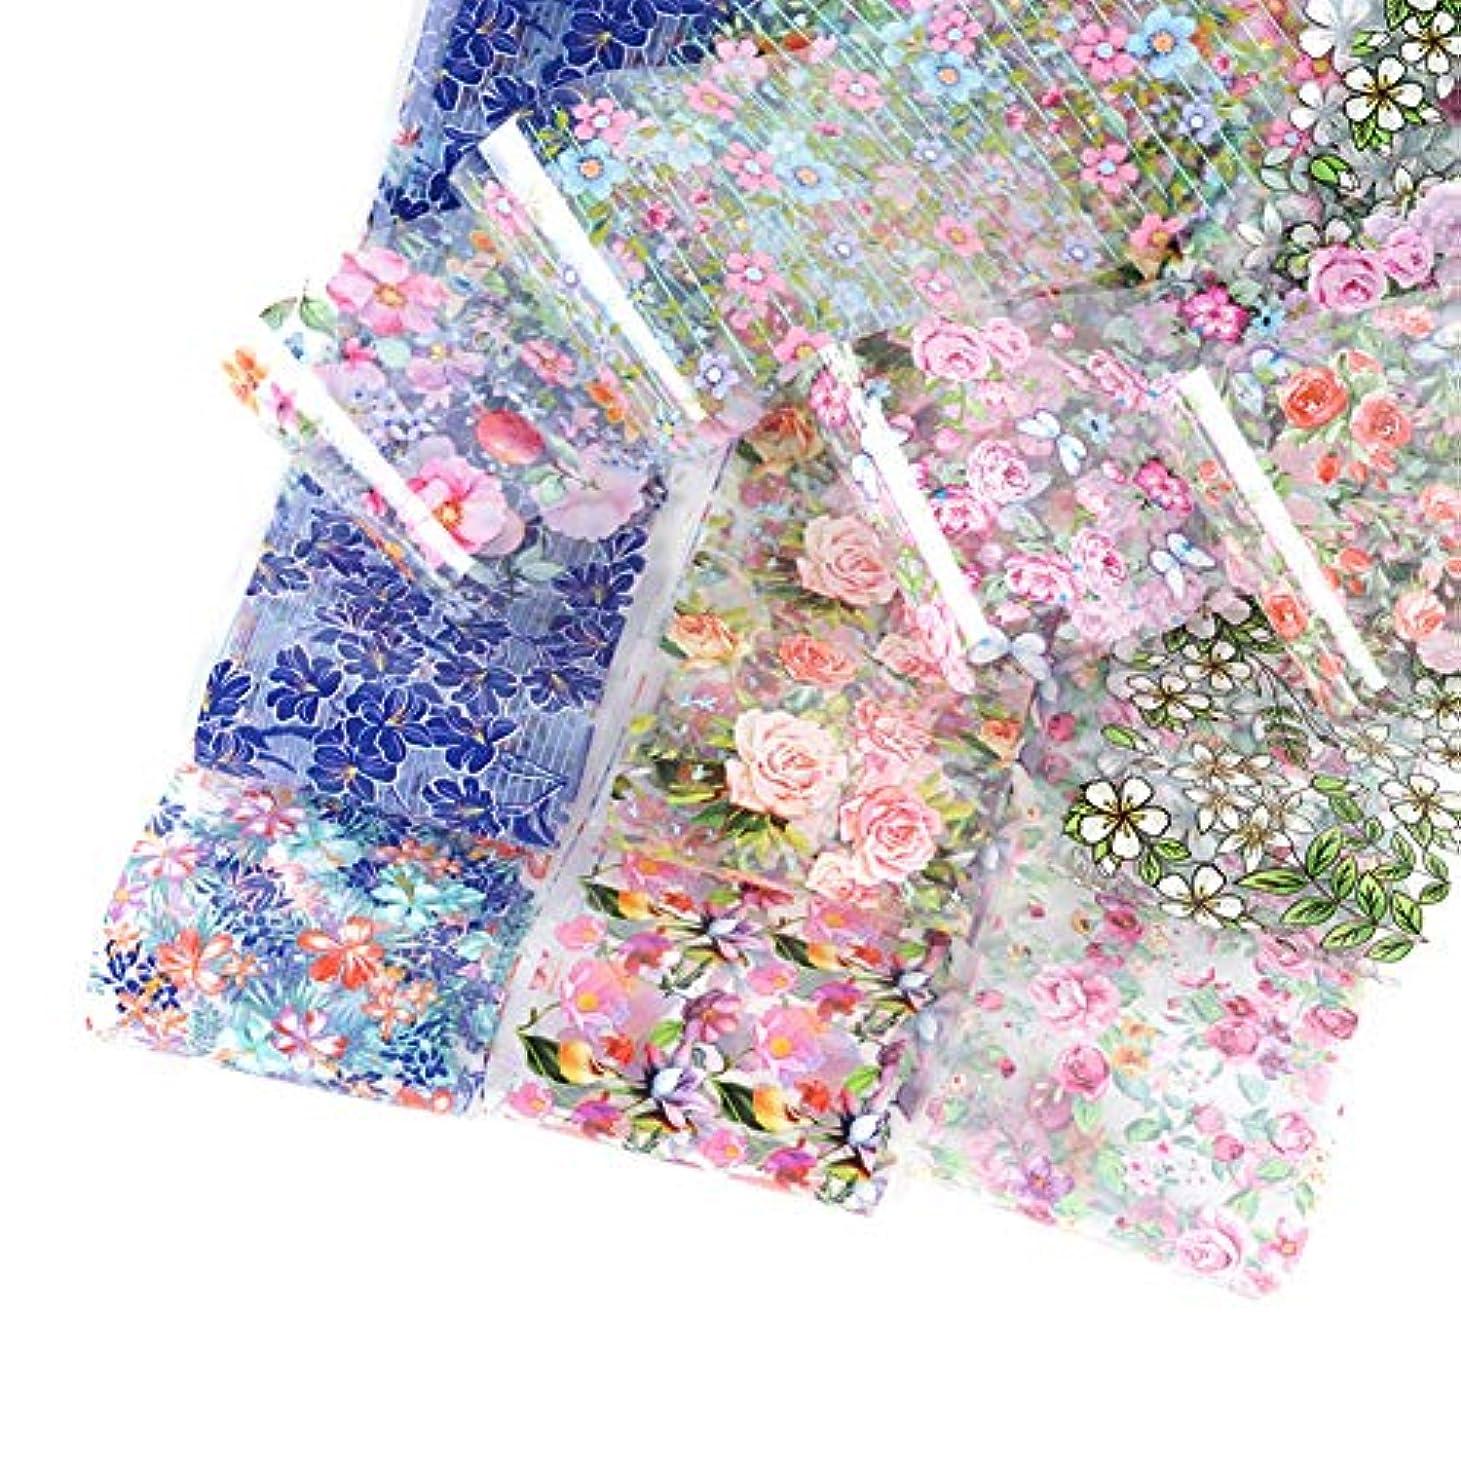 Radiya ネイルシール ネイルステッカー 星空ネイル シェル 花柄ネイルホイル 水彩の花 転写ホイル 箔紙 シェルプリント 極薄フィルム 10枚セット